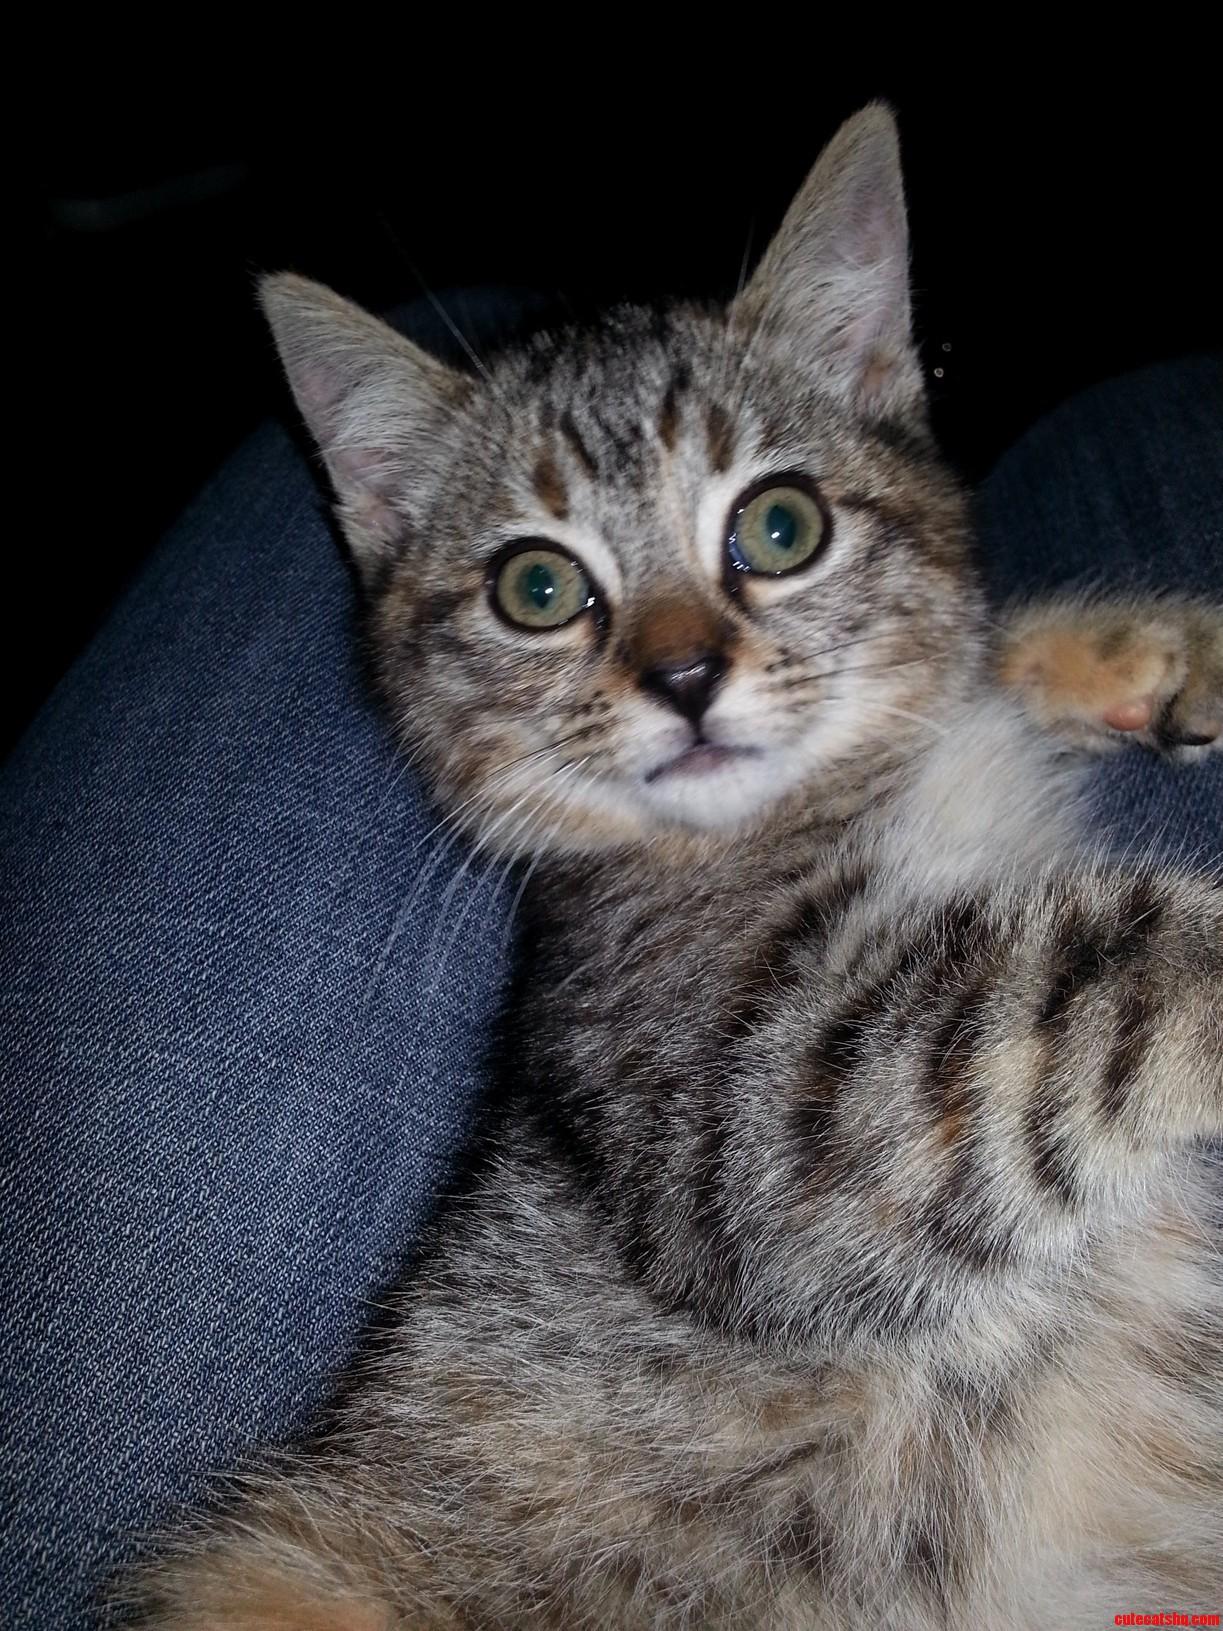 Igor My Kitten With A Lazy Eye